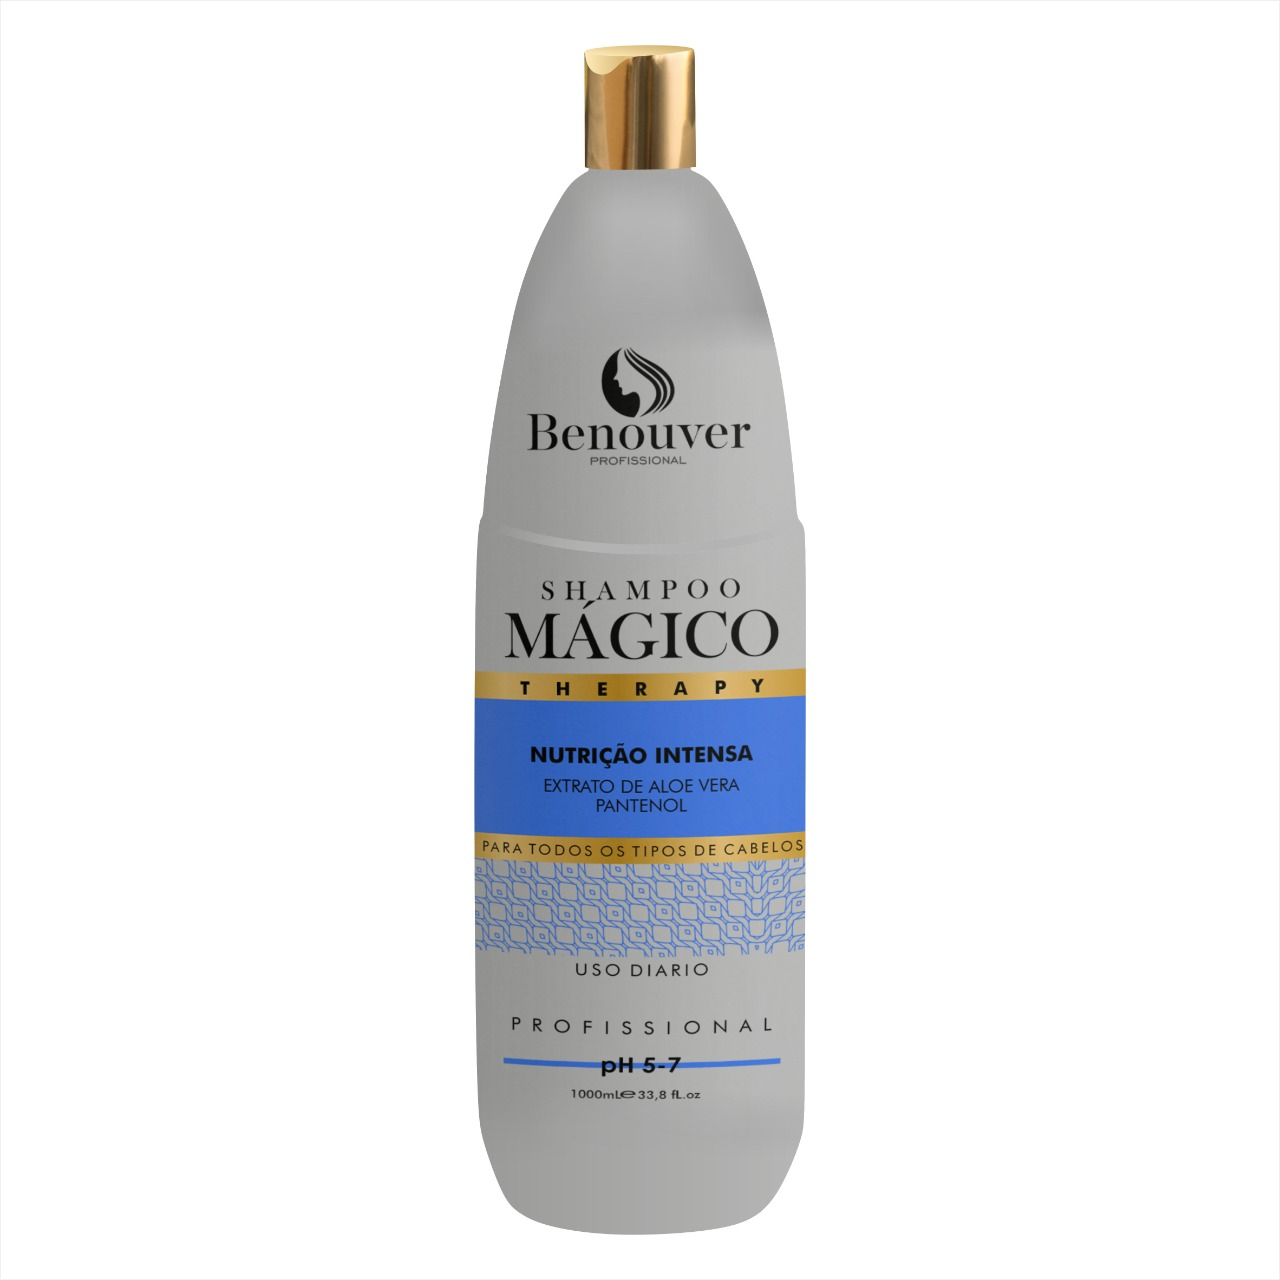 Shampoo Mágico Therapy Benouver Profissional - 1000ml  - Benouver Profissional